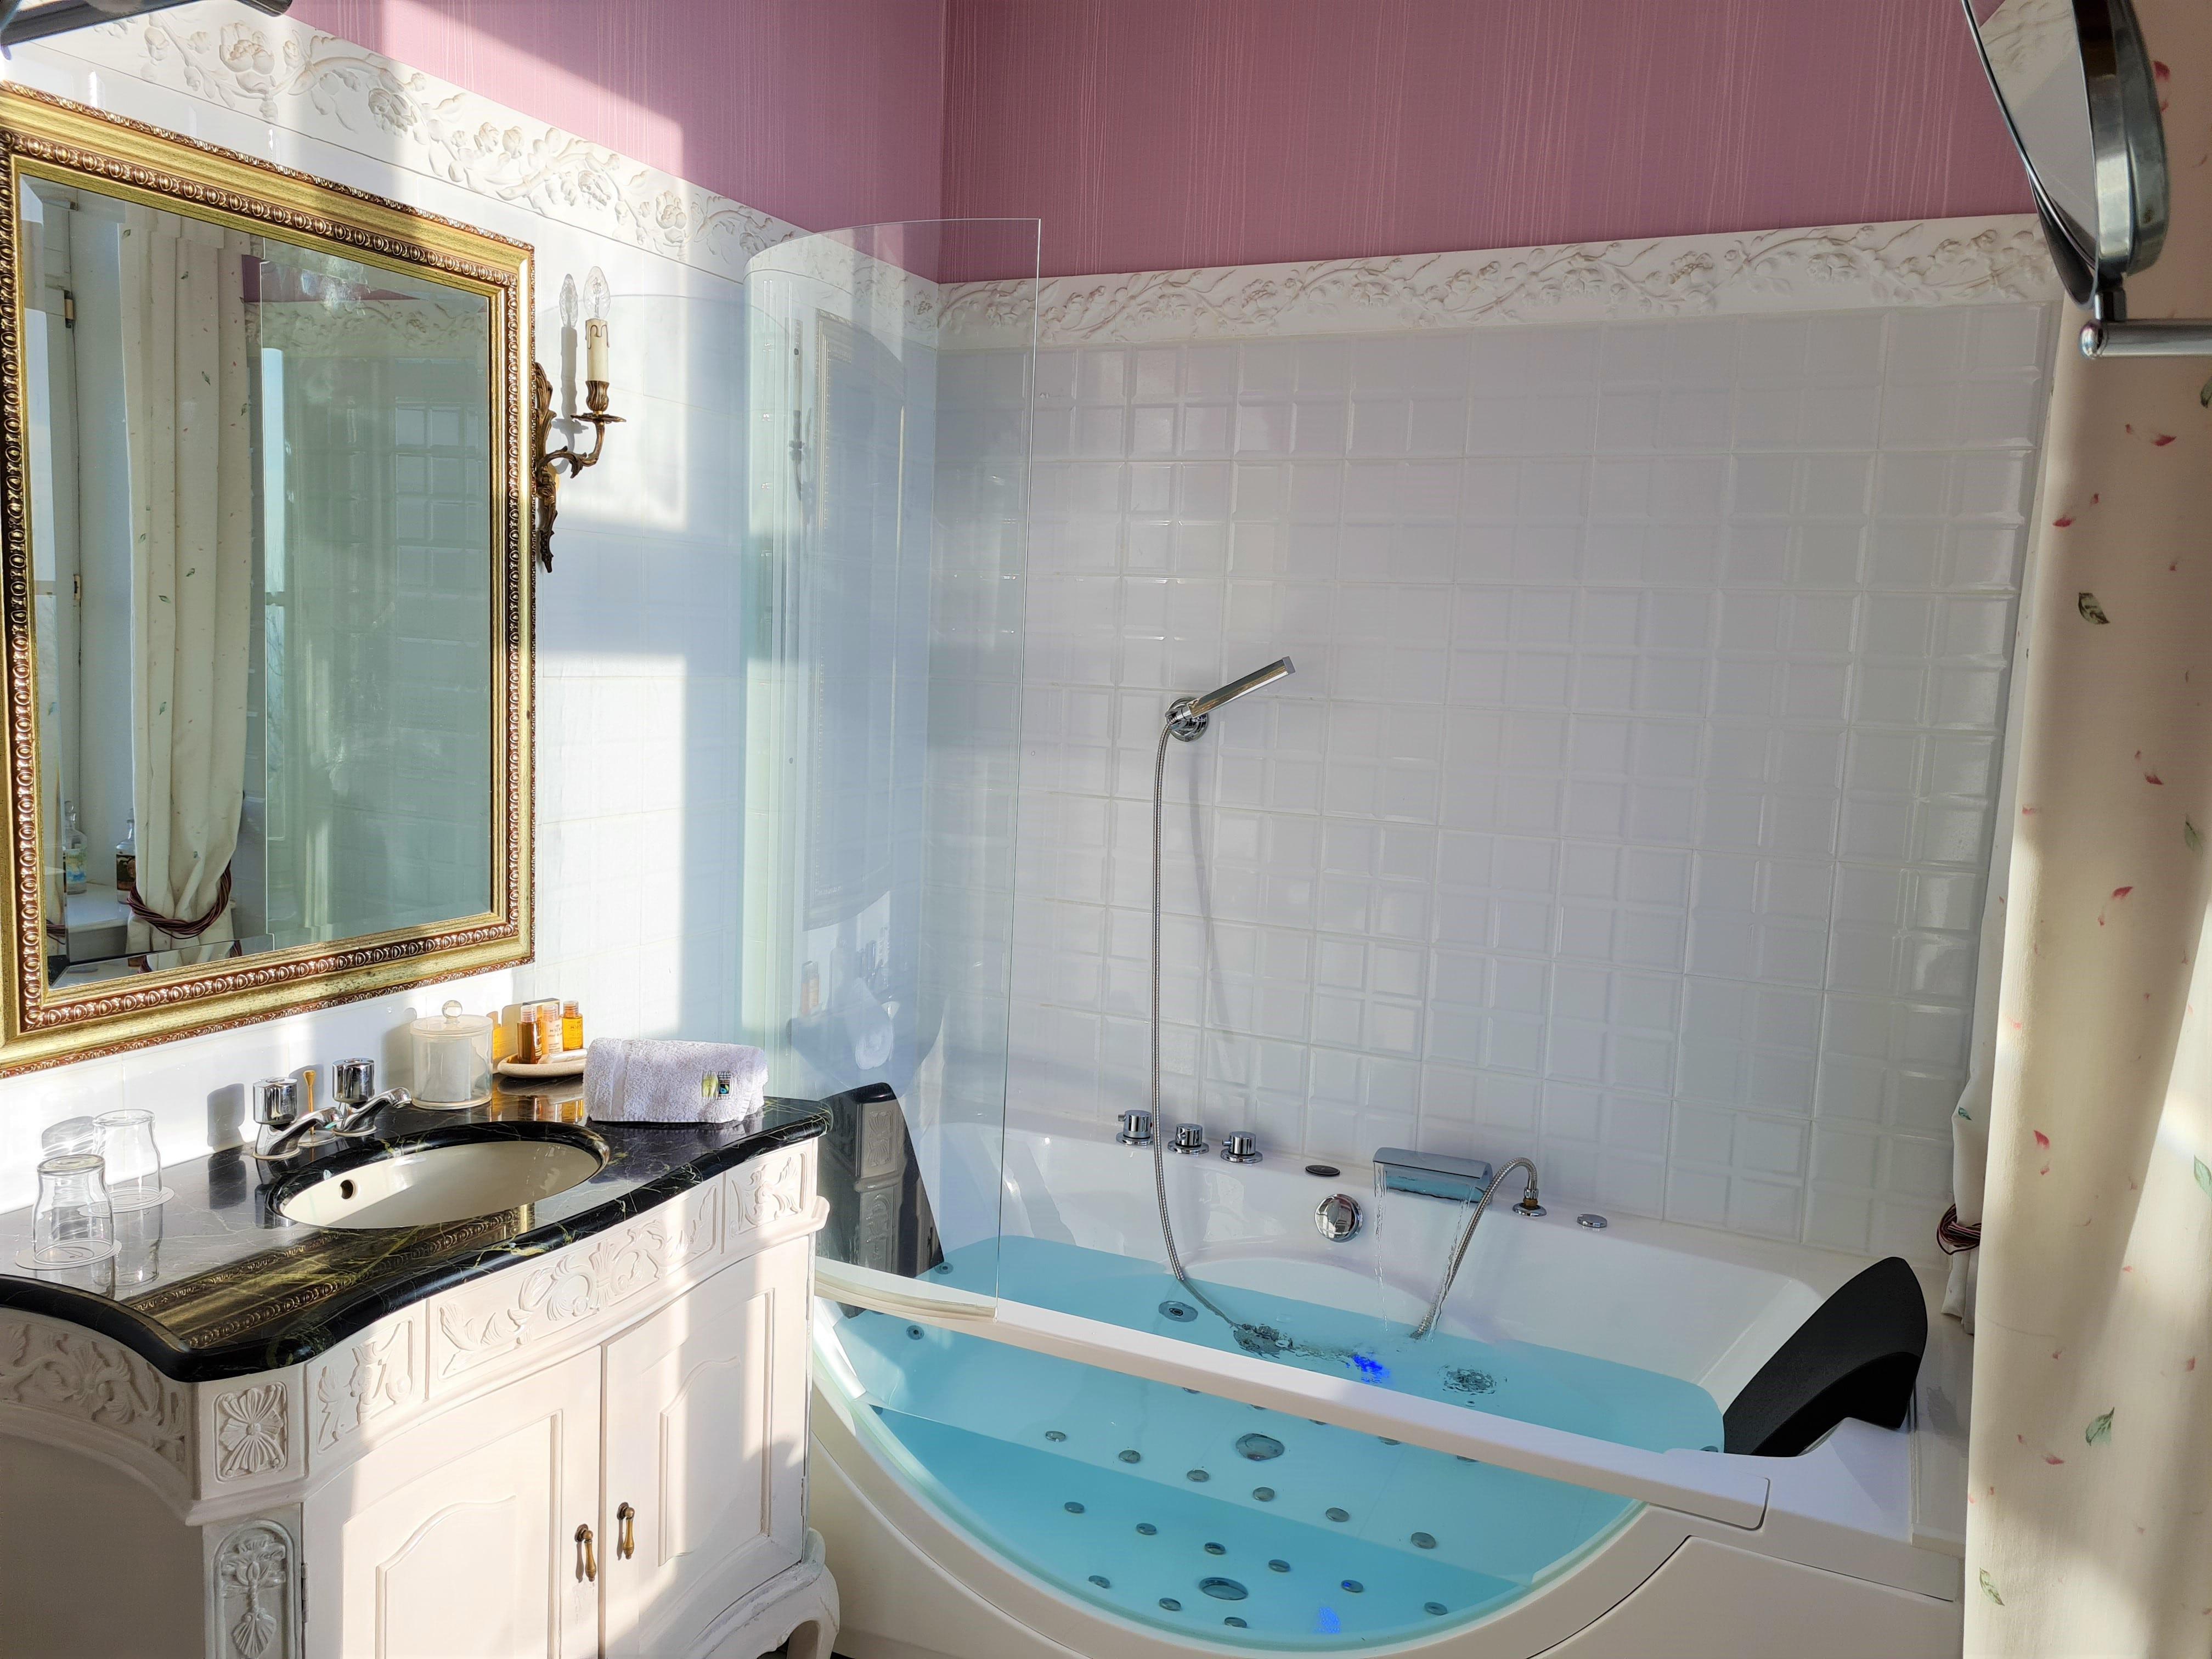 baignoire balnéo la vie en rose